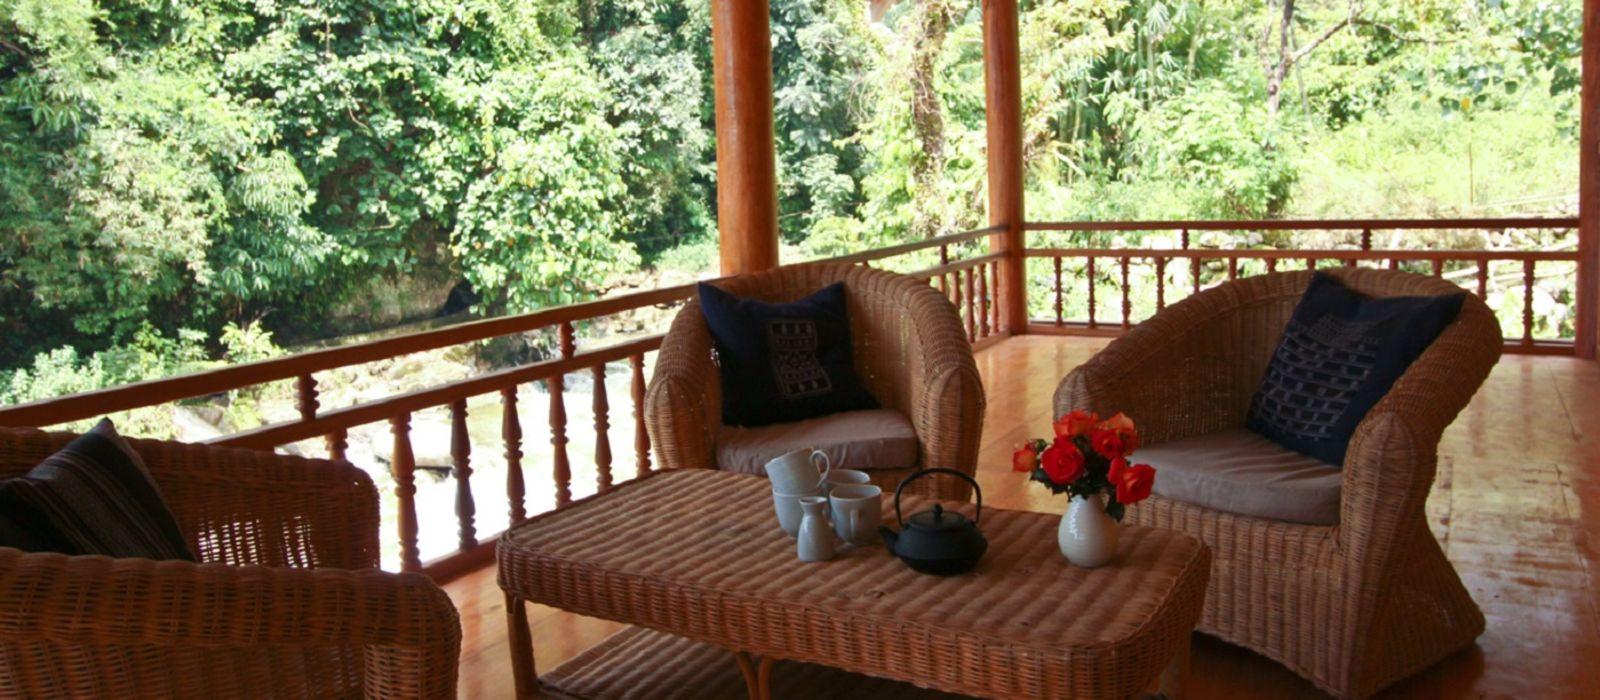 Hotel Nam Cang Riverside Lodge Vietnam